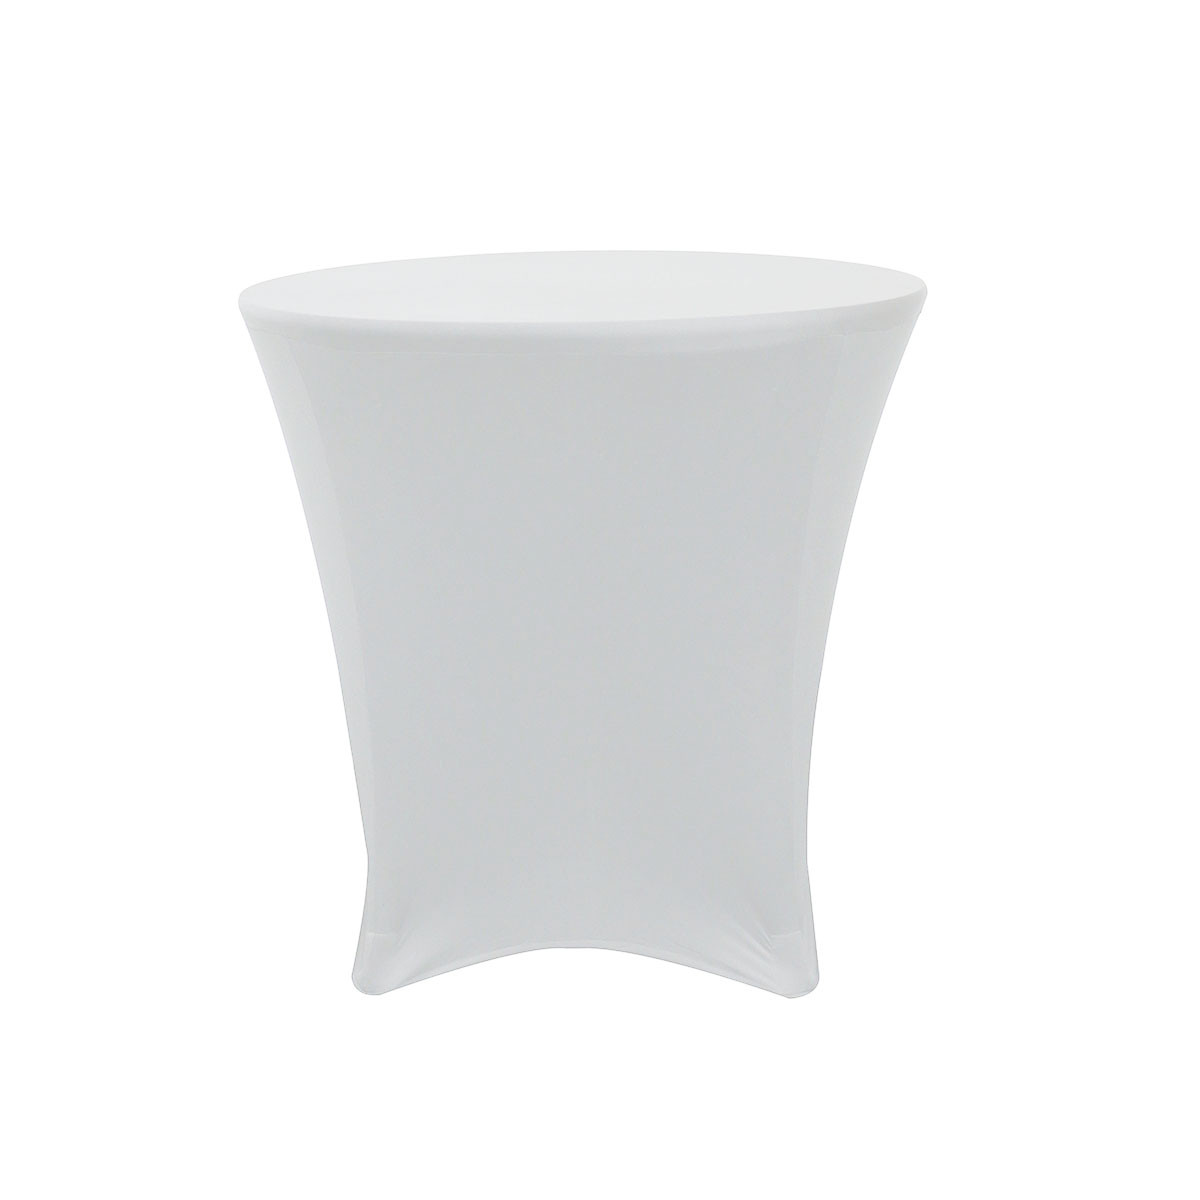 30 X 30 Inch Lowboy Cocktail Round Stretch Spandex Table